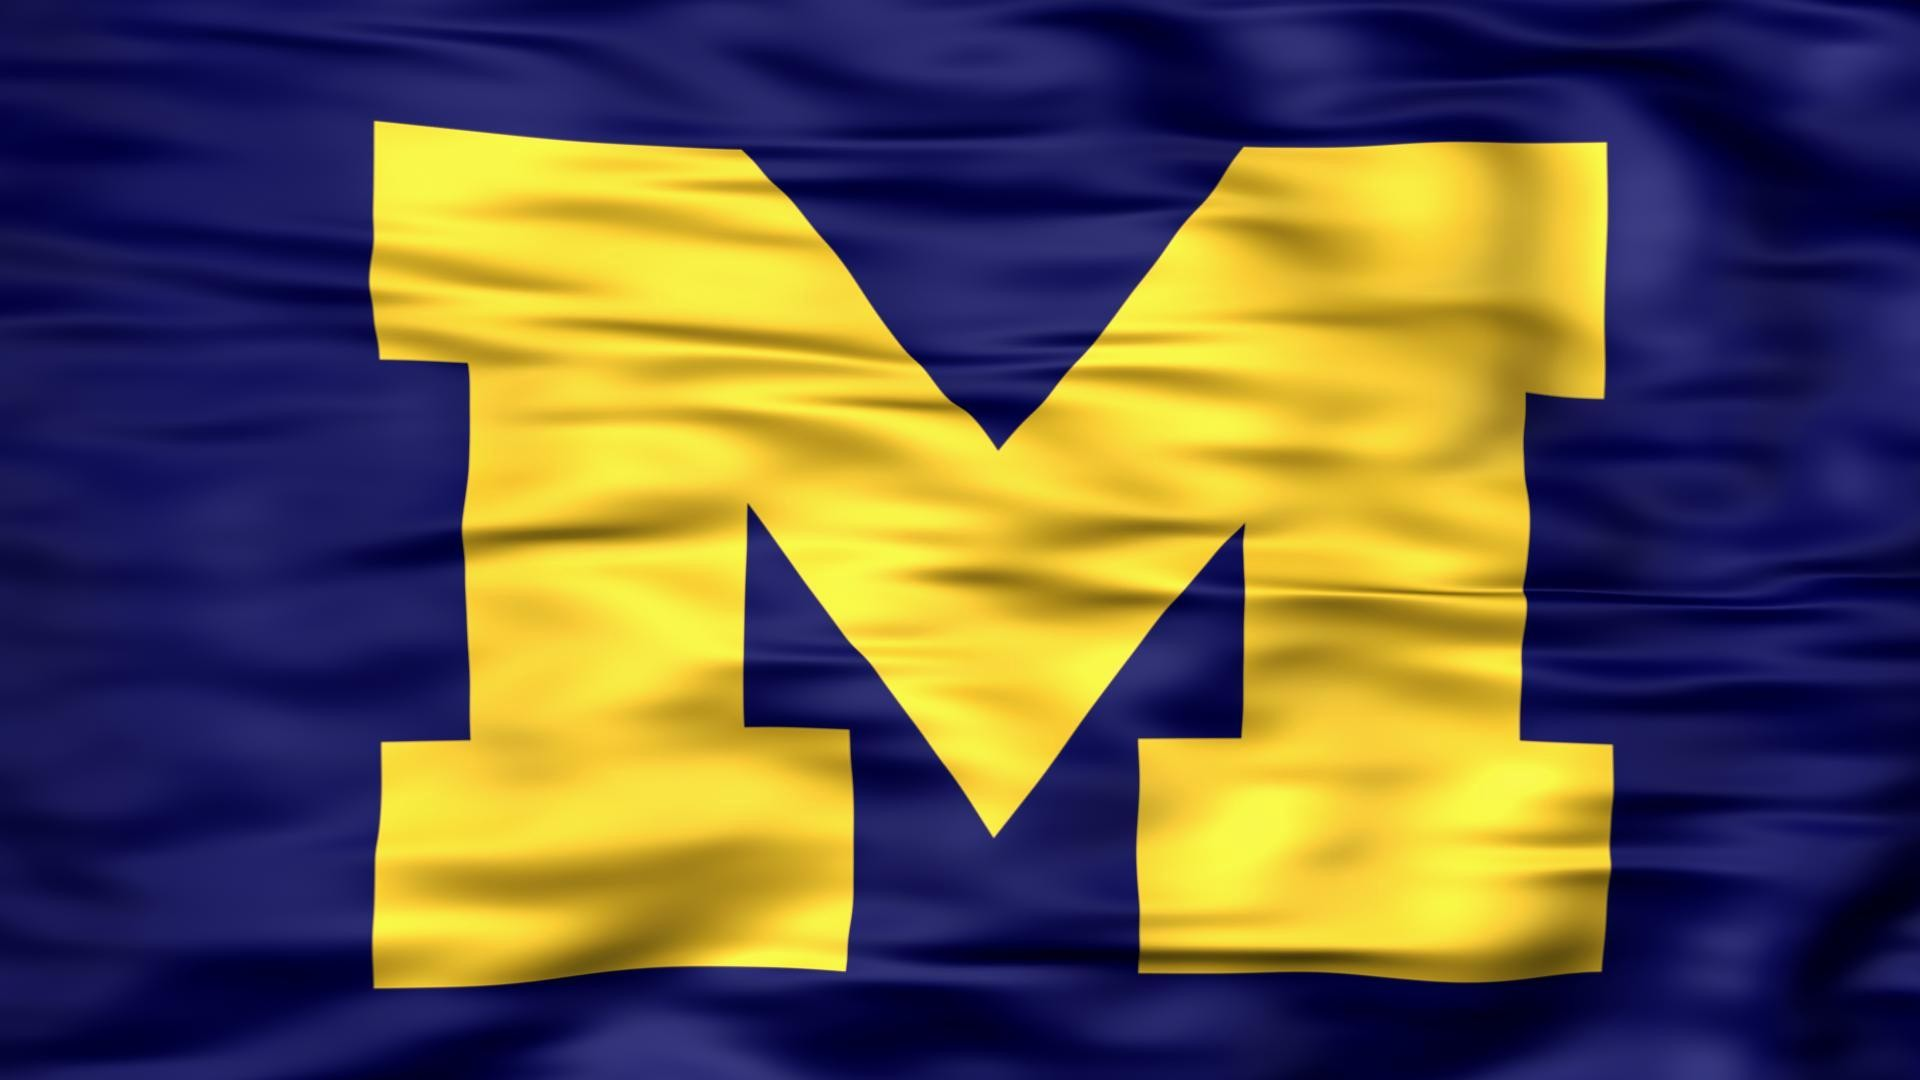 University Of Michigan Wallpaper